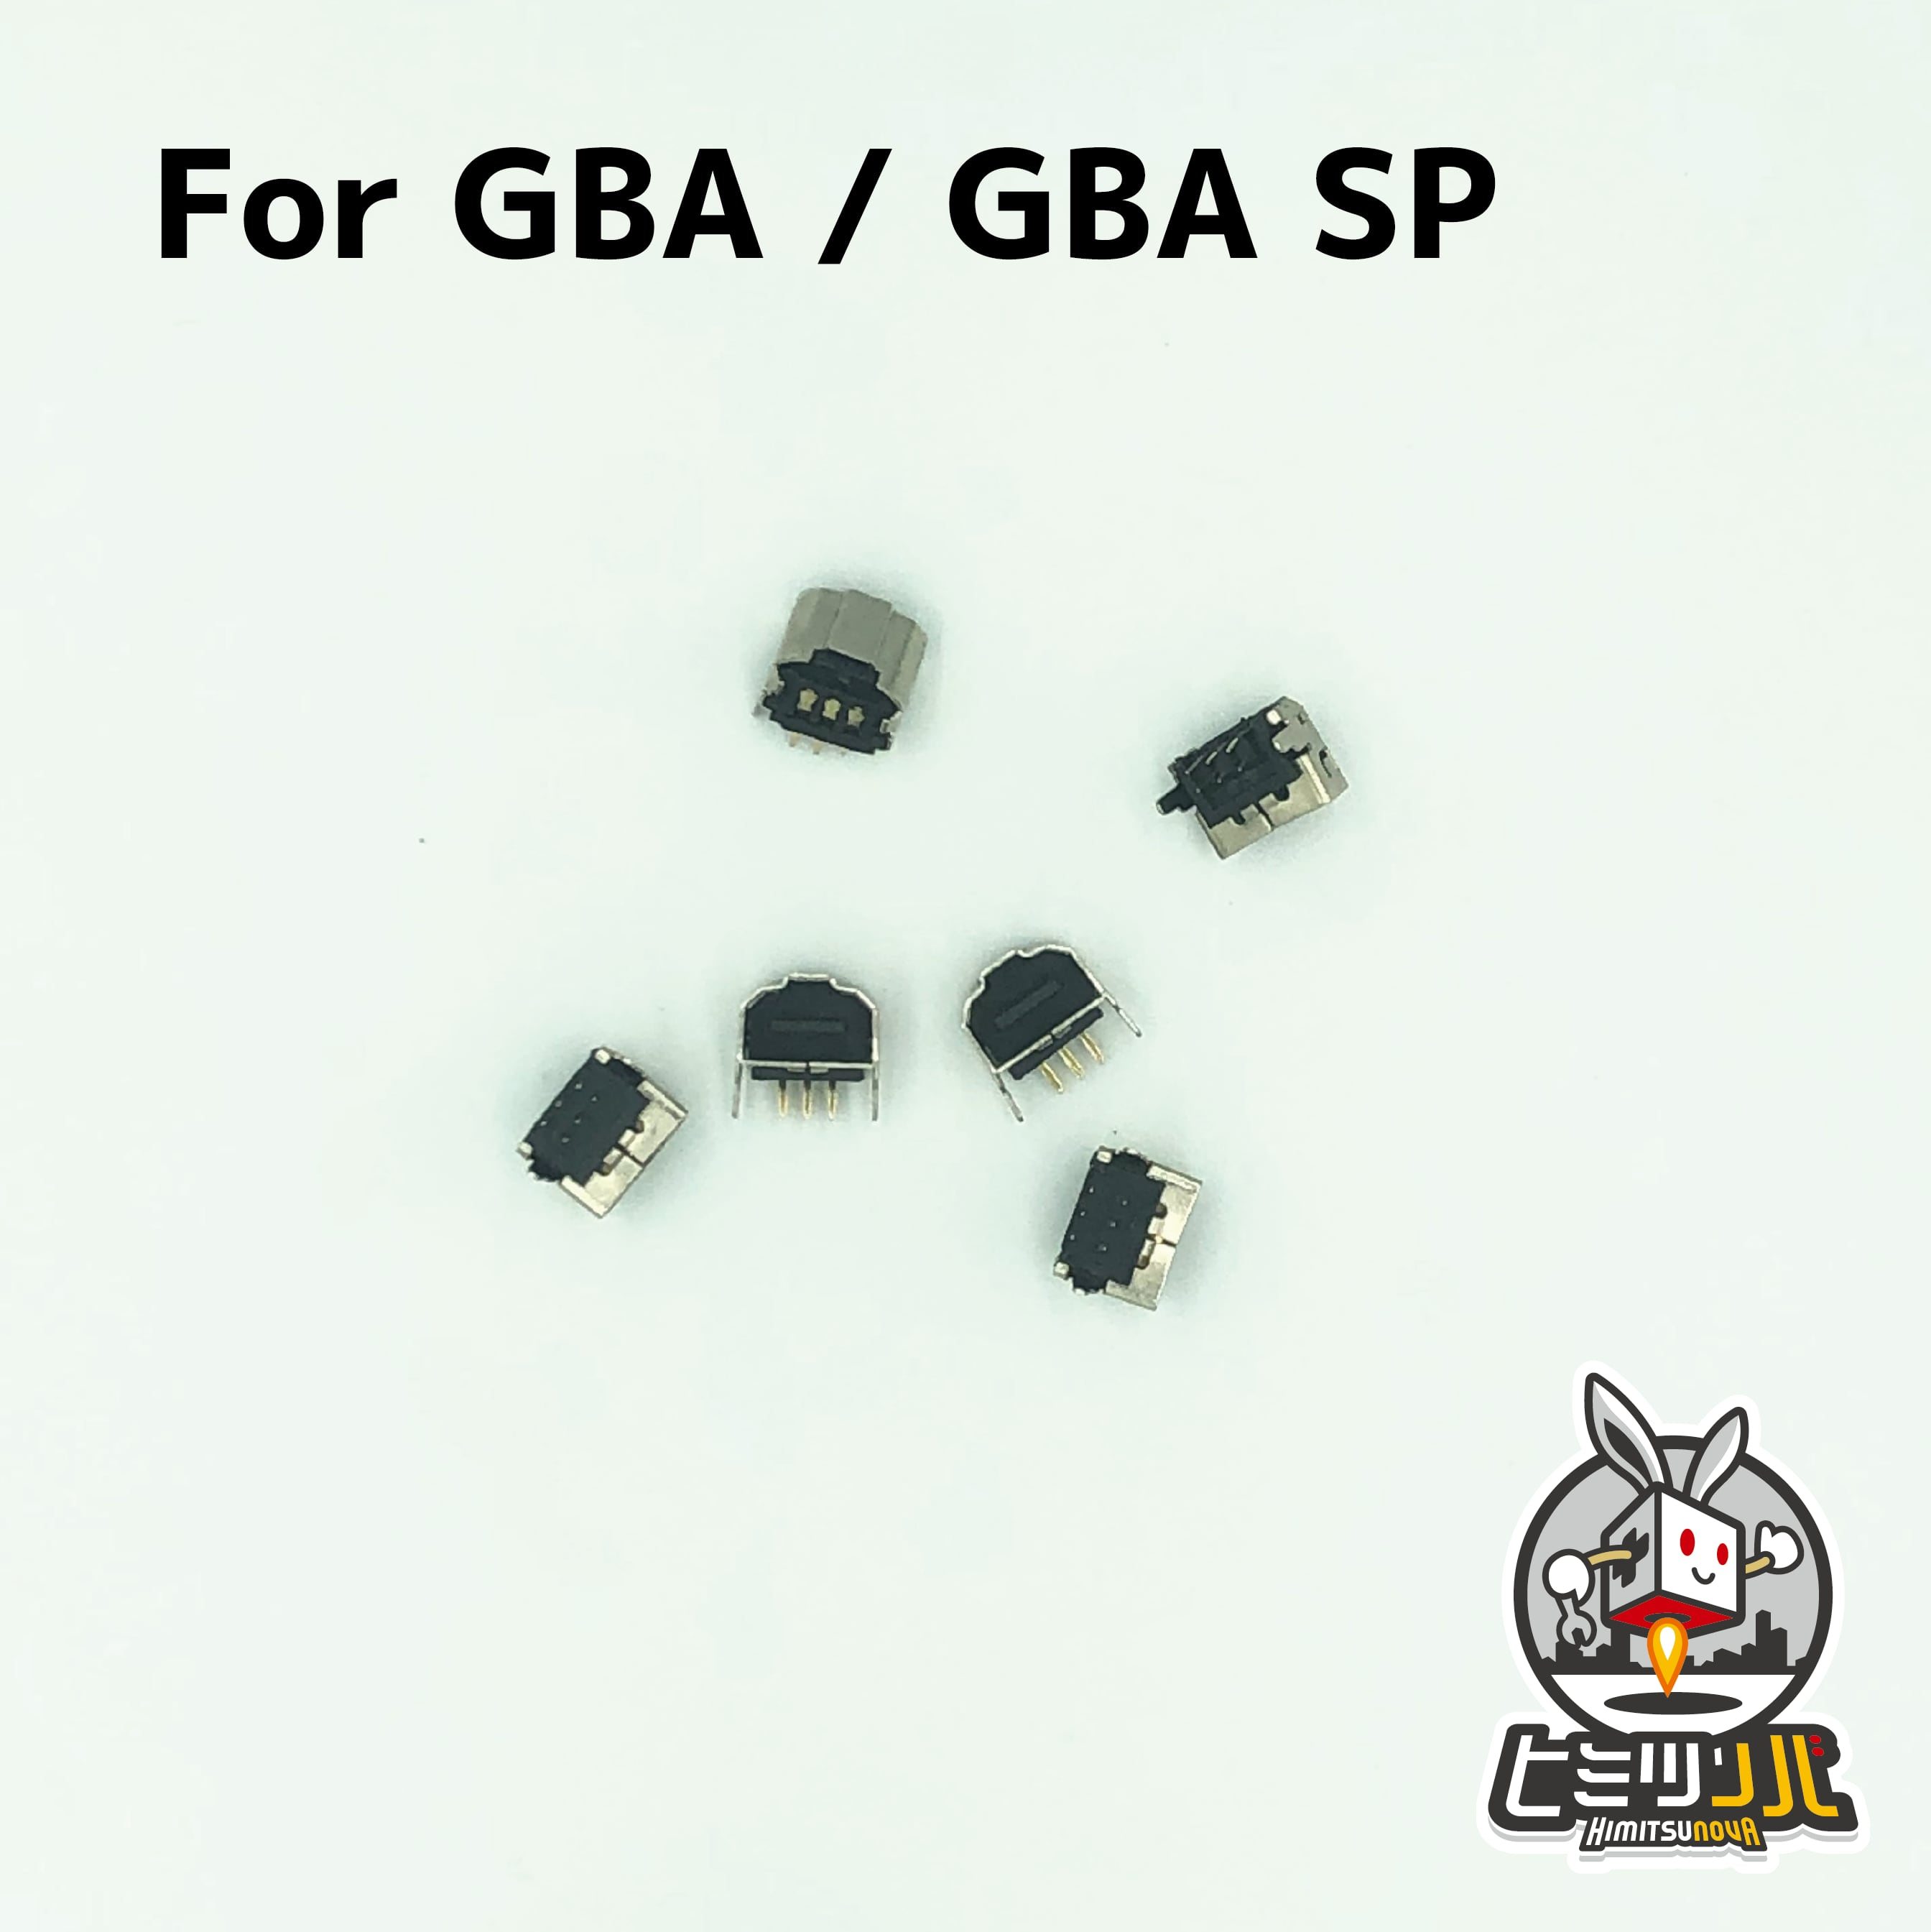 【GBA / GBASP】通信コネクタ